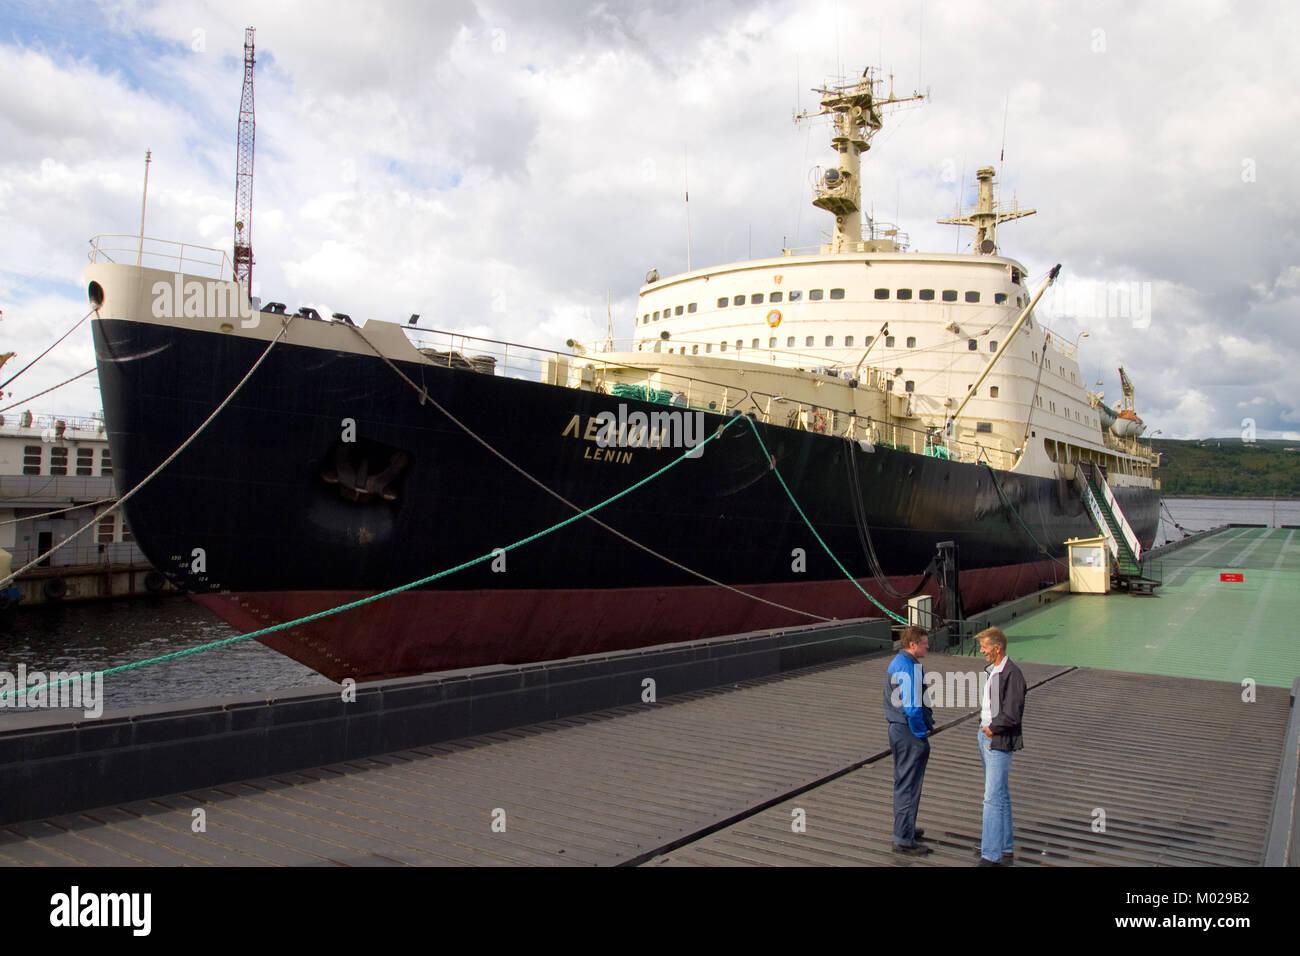 Murmansk, Russia - June 26, 2010: Icebreaker 'Lenin' - Stock Image